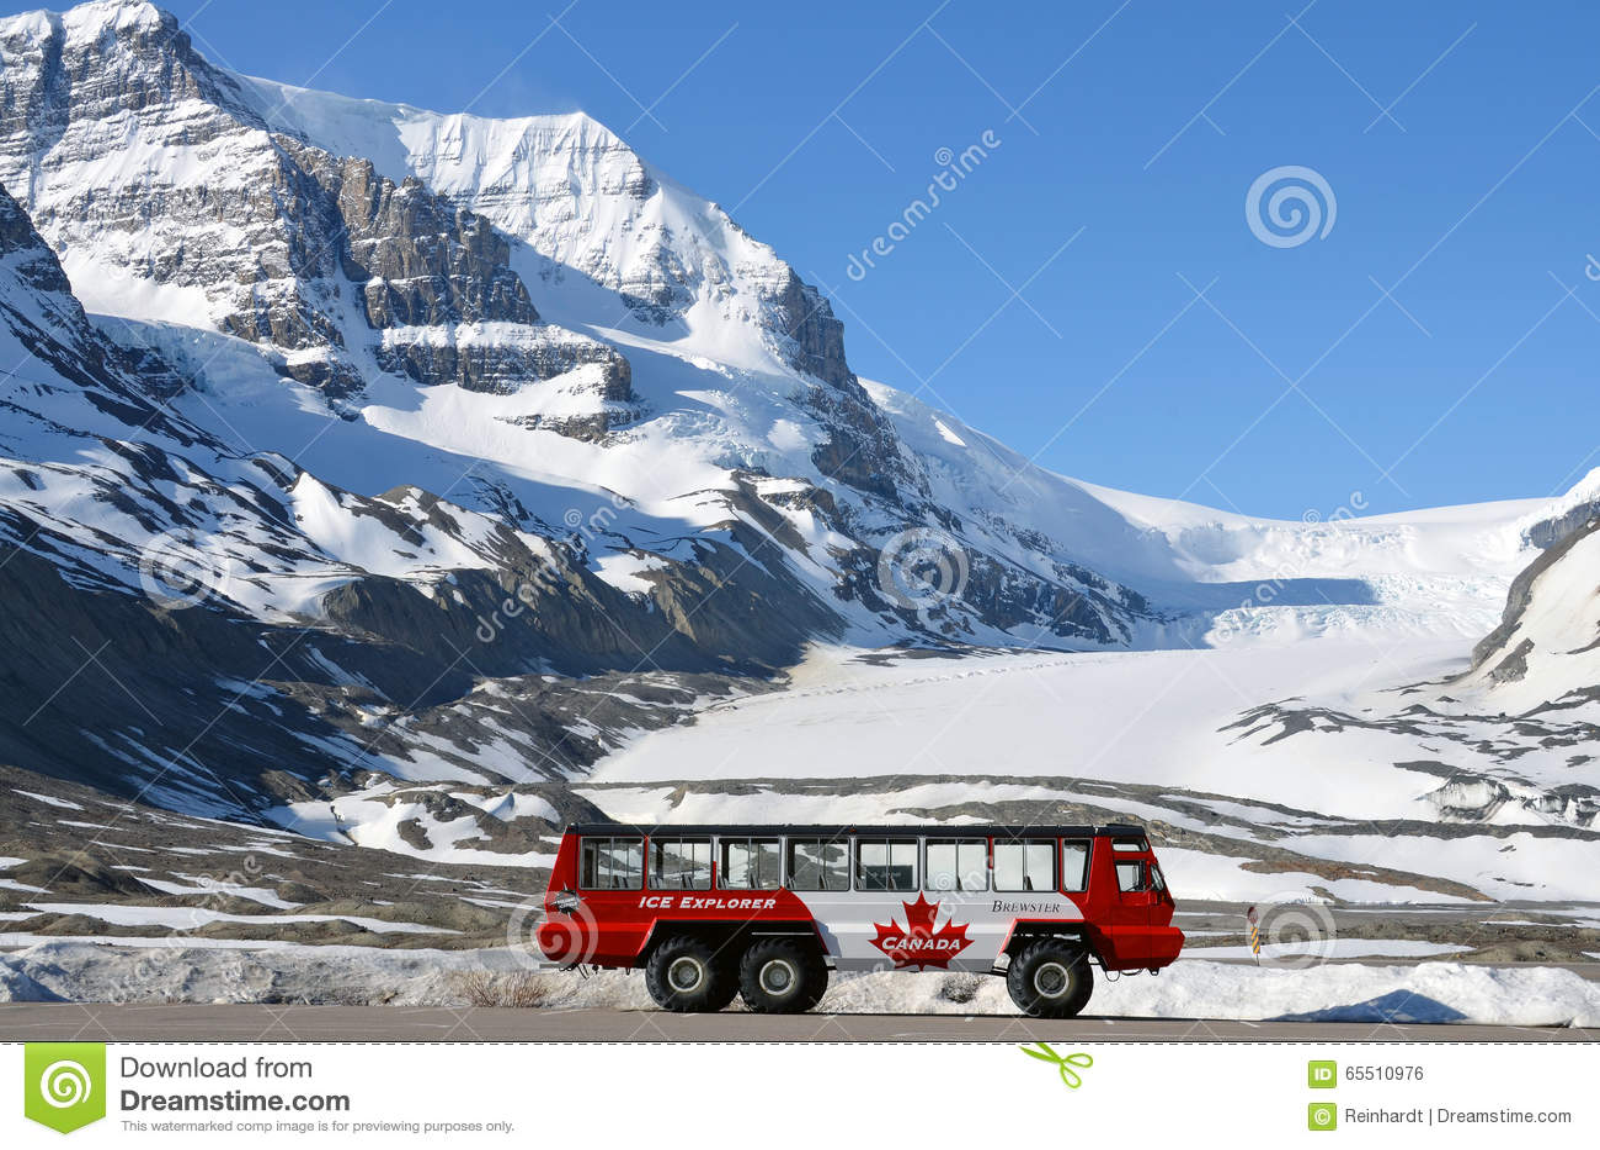 Athabasca Glacier Tours Jasper